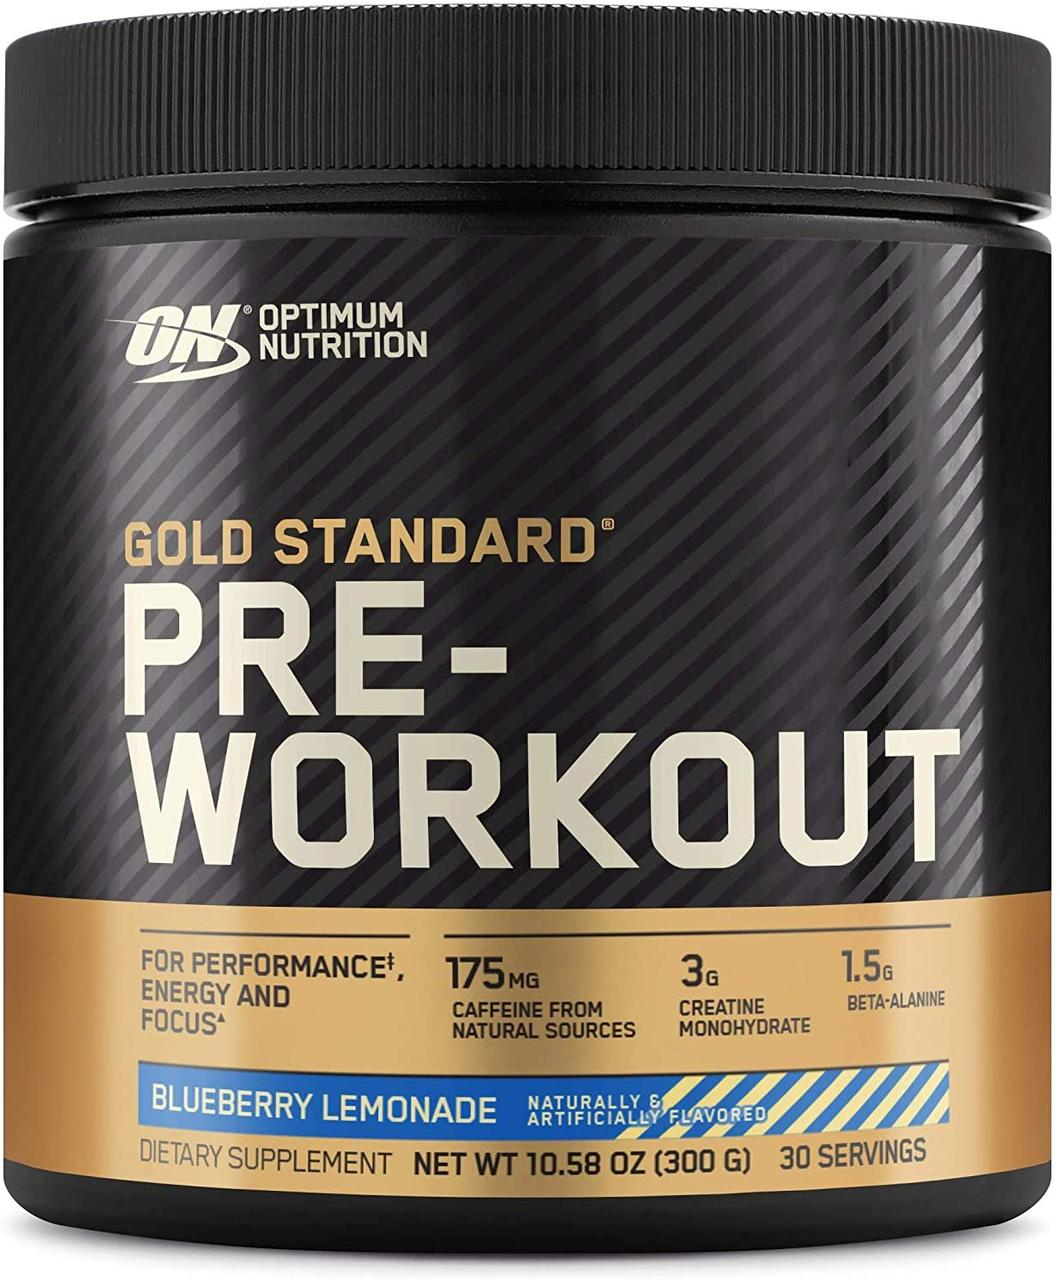 Предтреник Optimum Nutrition Pre-Workout gold standard (300 г) оптимумт нутришн blueberry lemonade